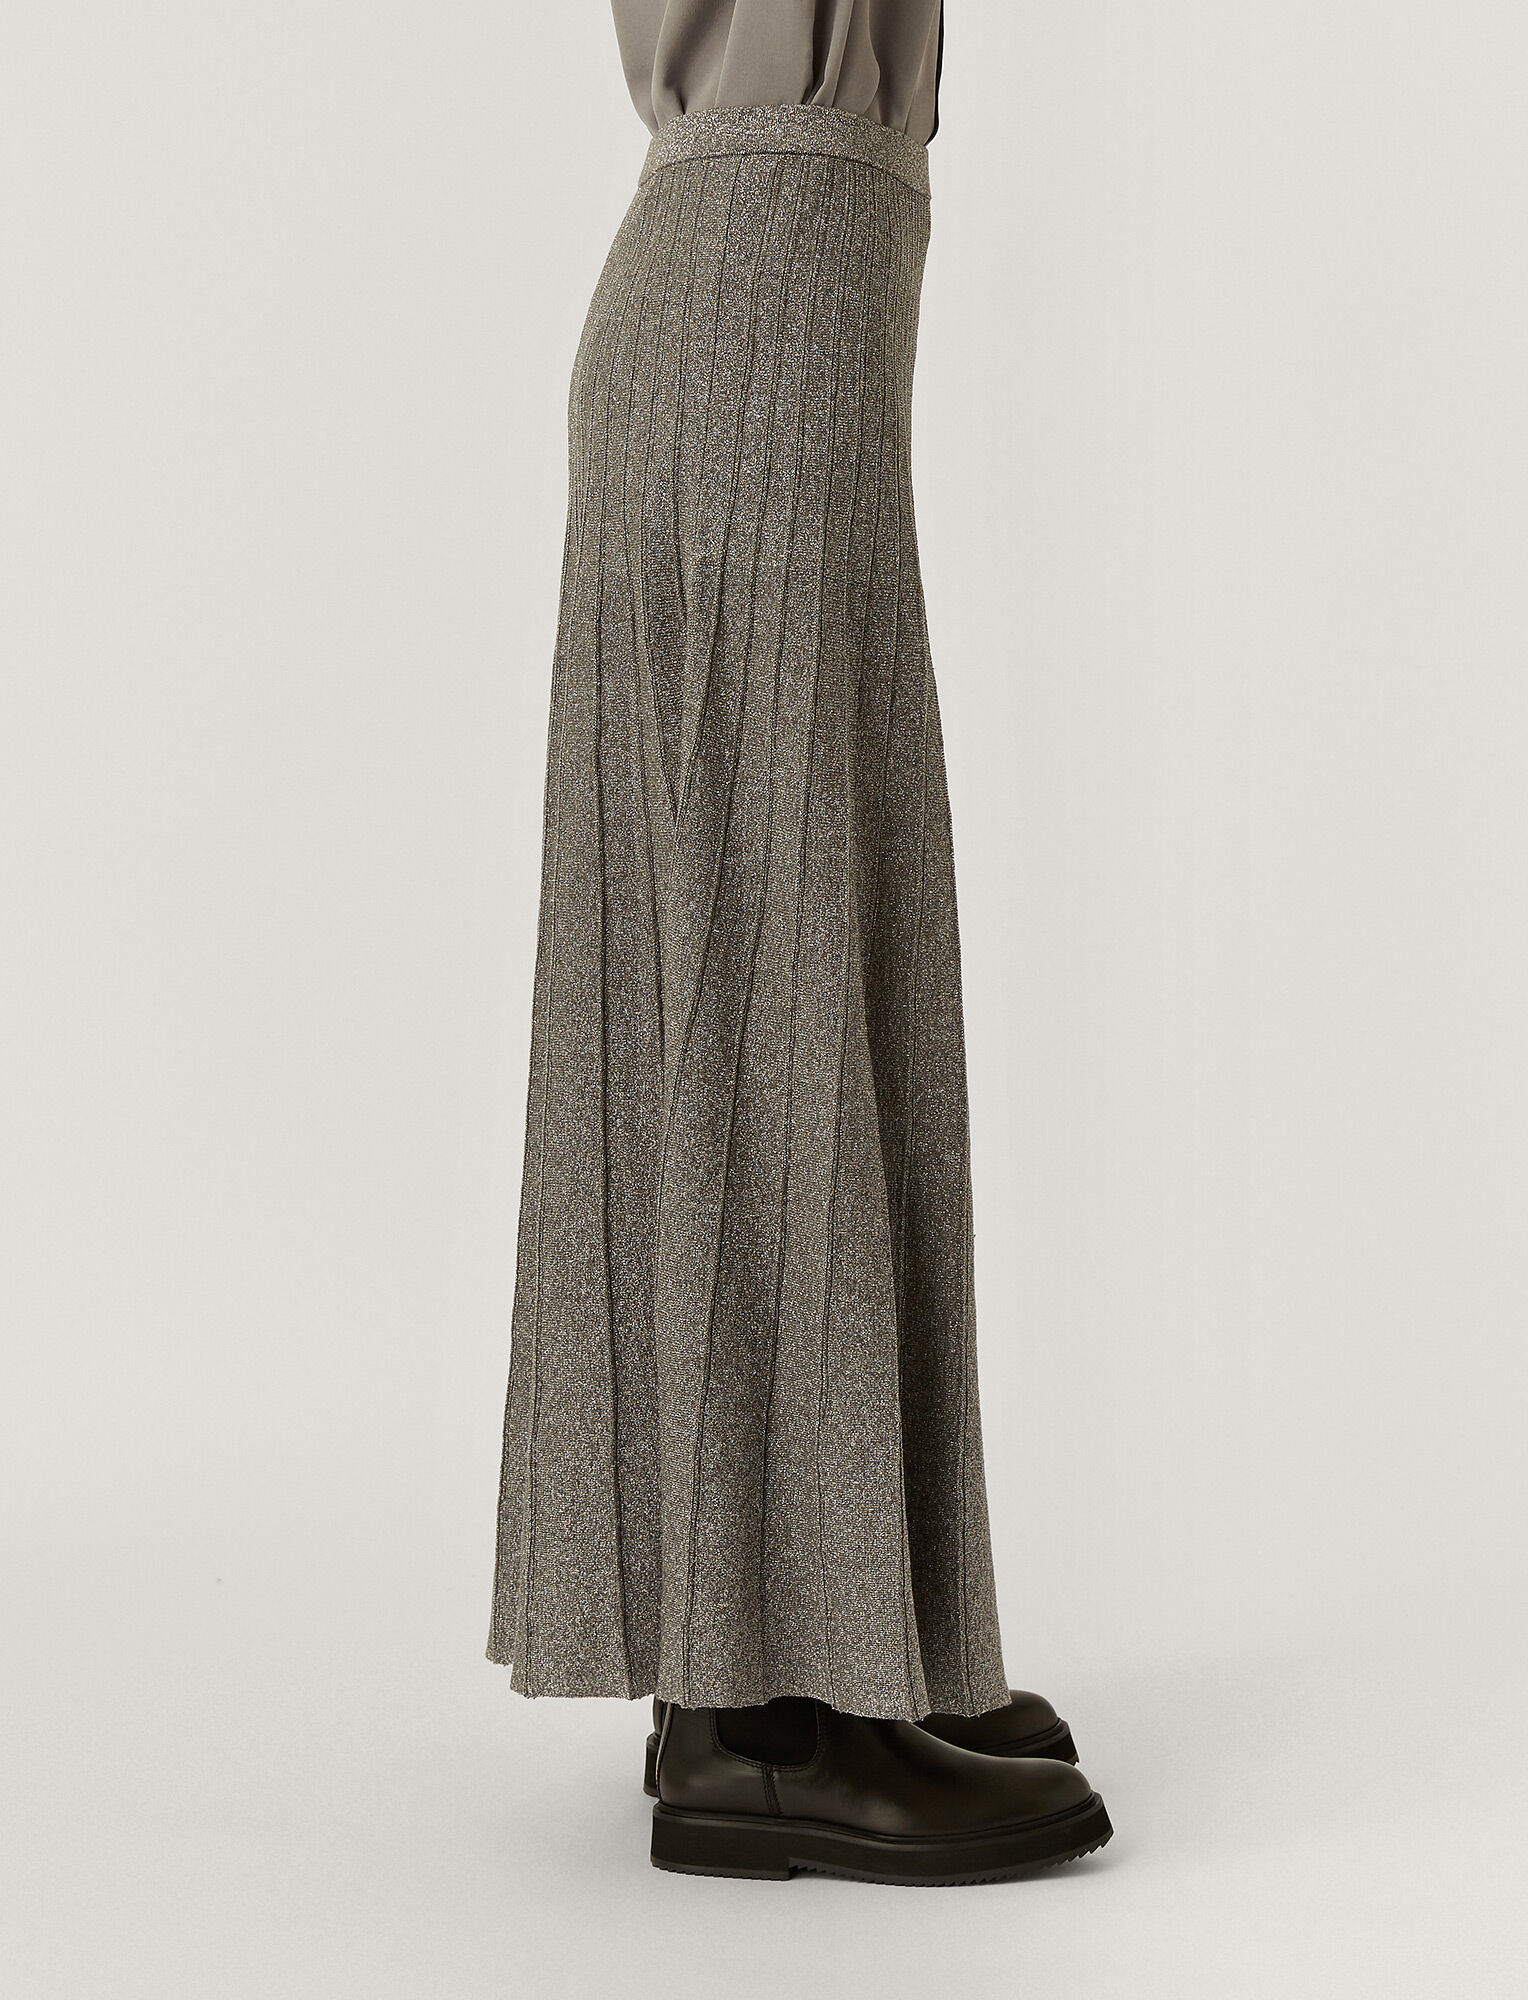 Joseph, Lurex Skirt, in ANTHRACITE